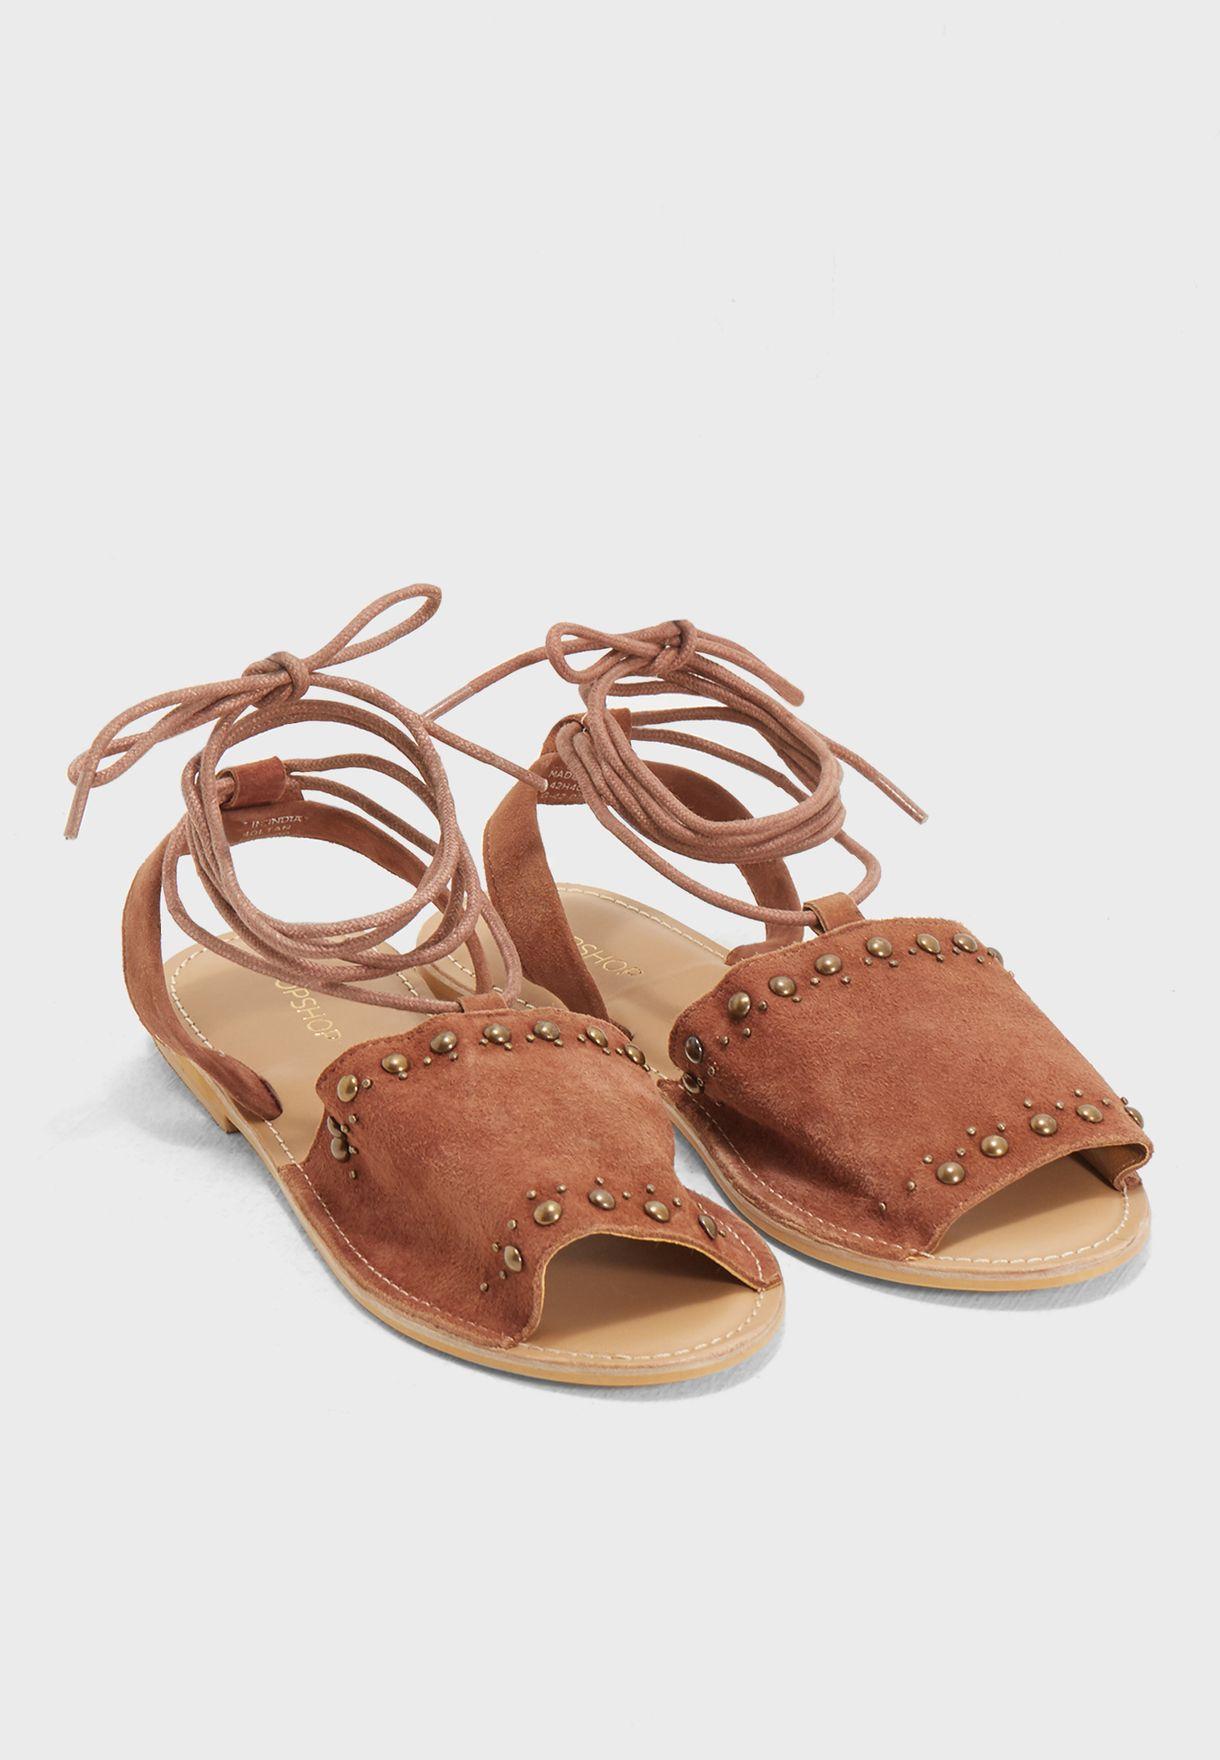 d1e76d274 Shop Topshop browns Hope Tie Up Sandal 42H40LTAN for Women in Kuwait ...